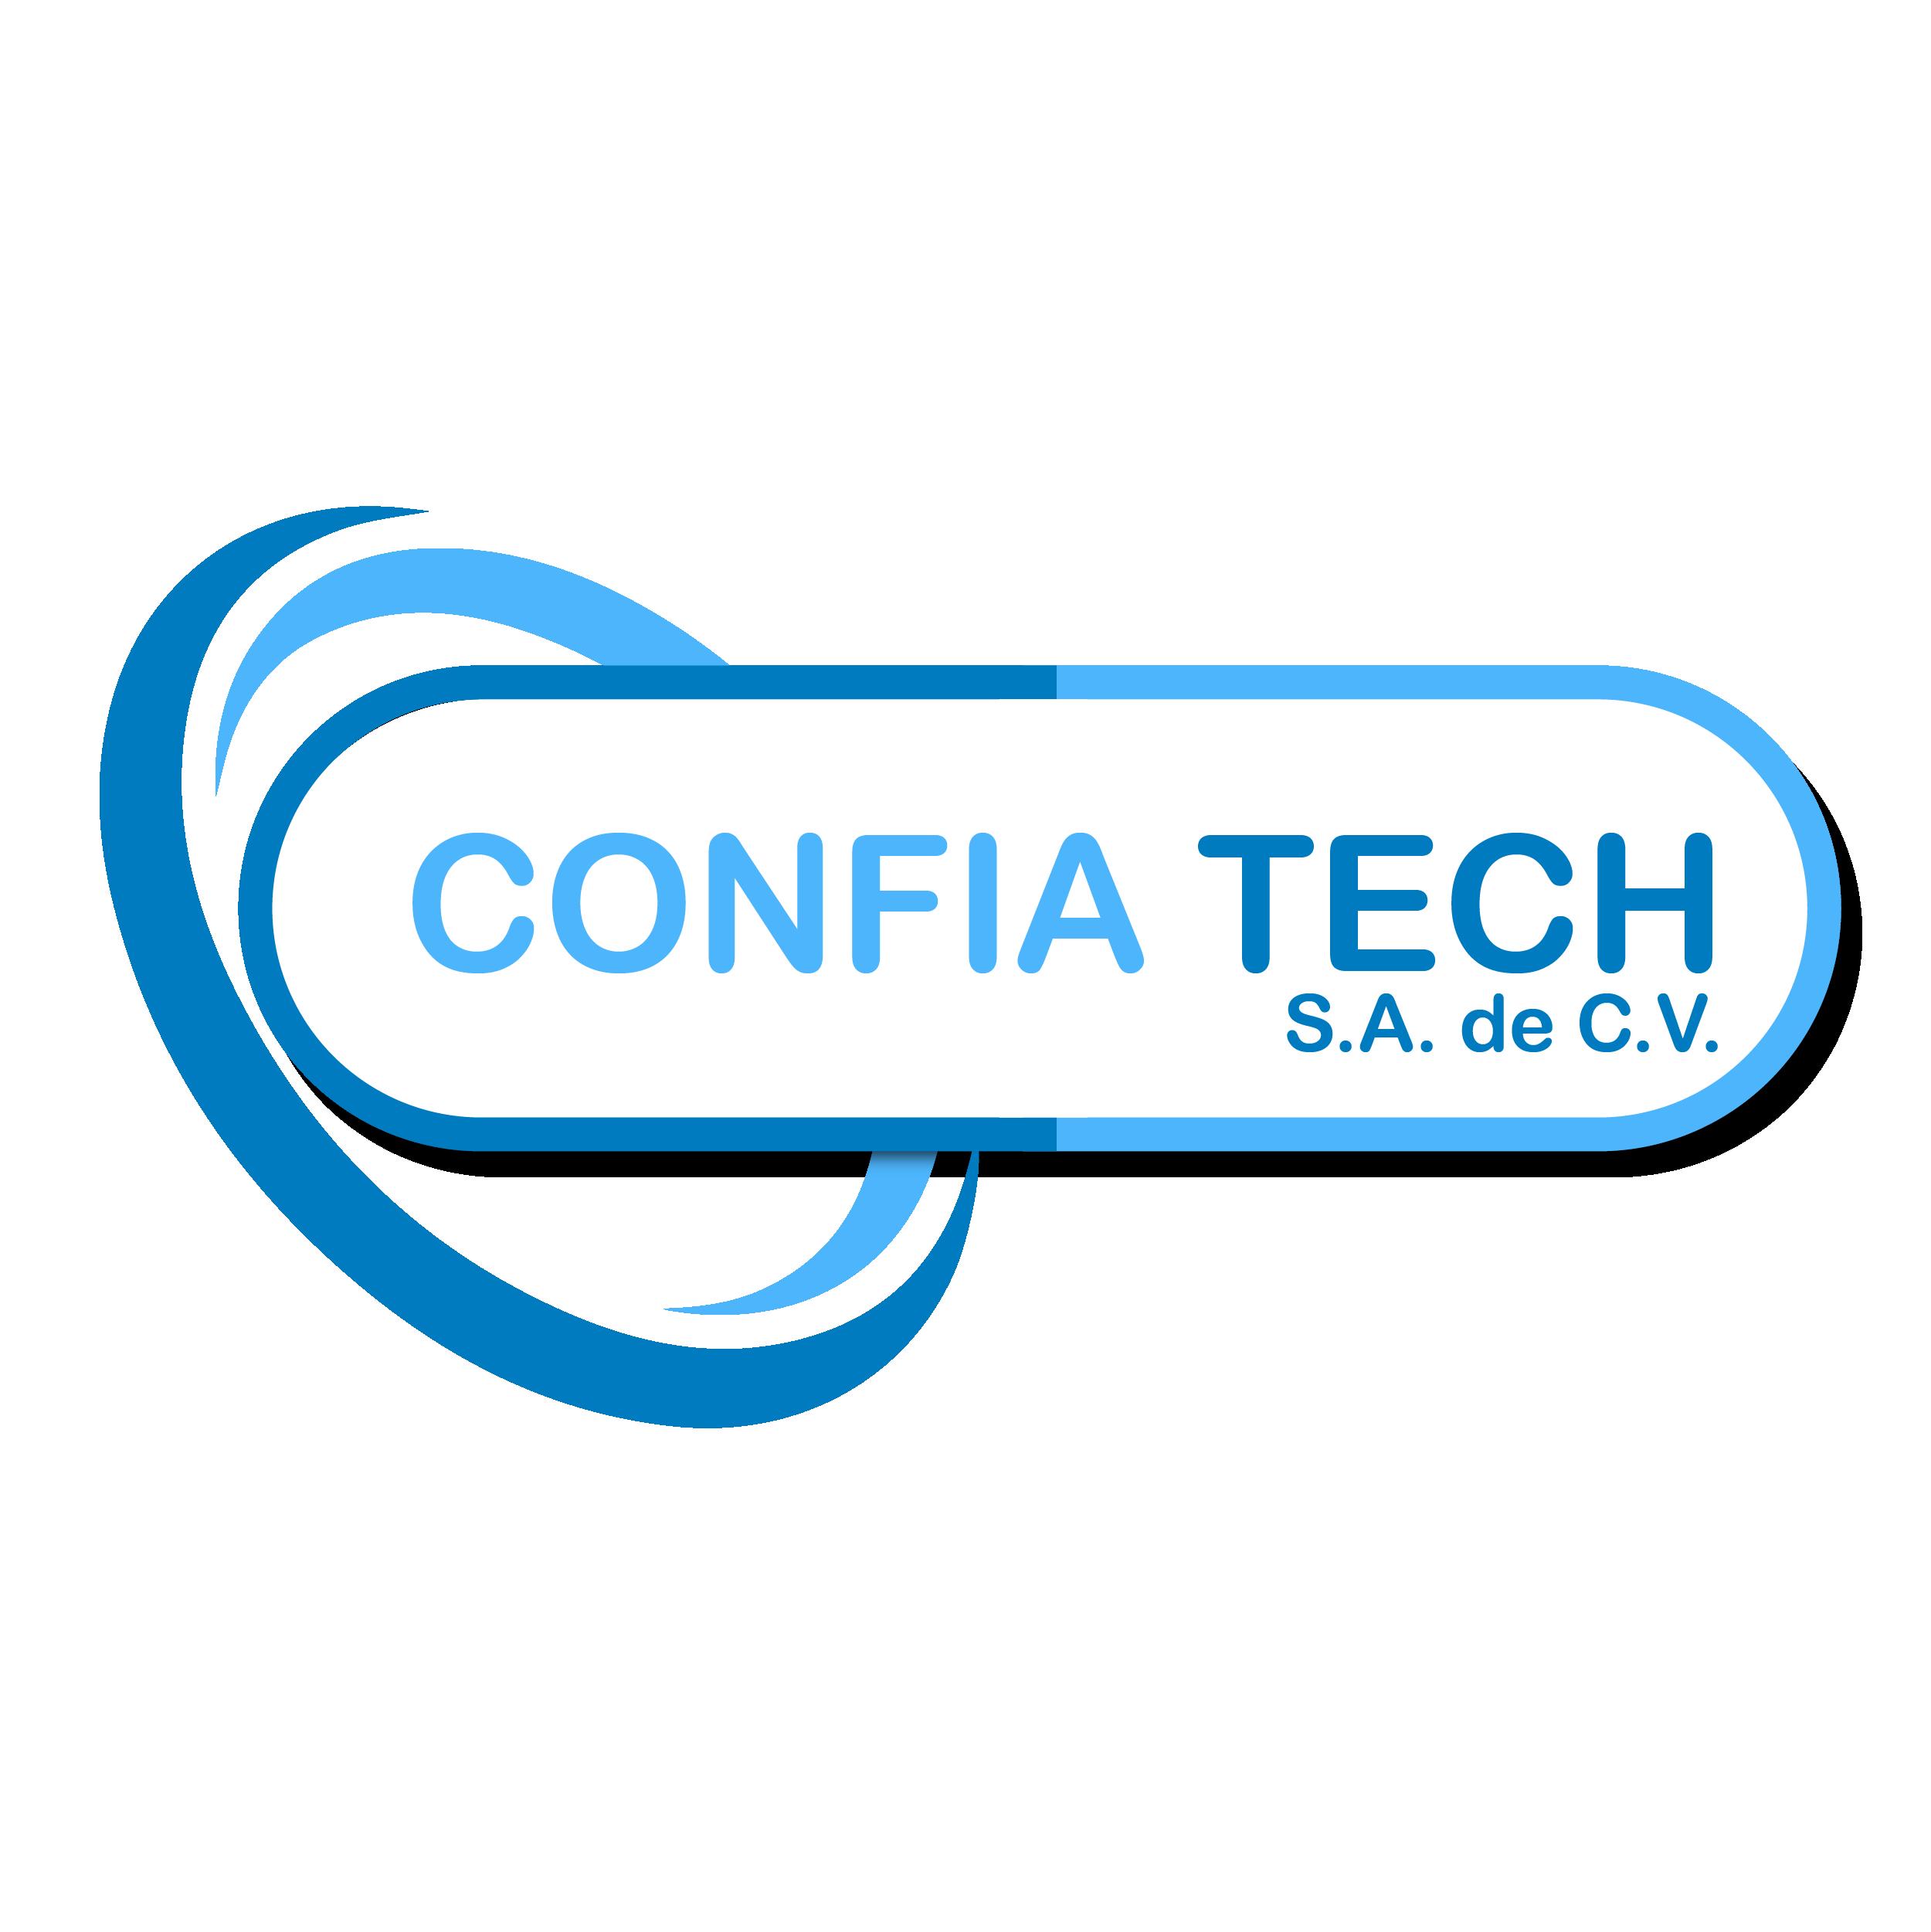 ConfiaTech